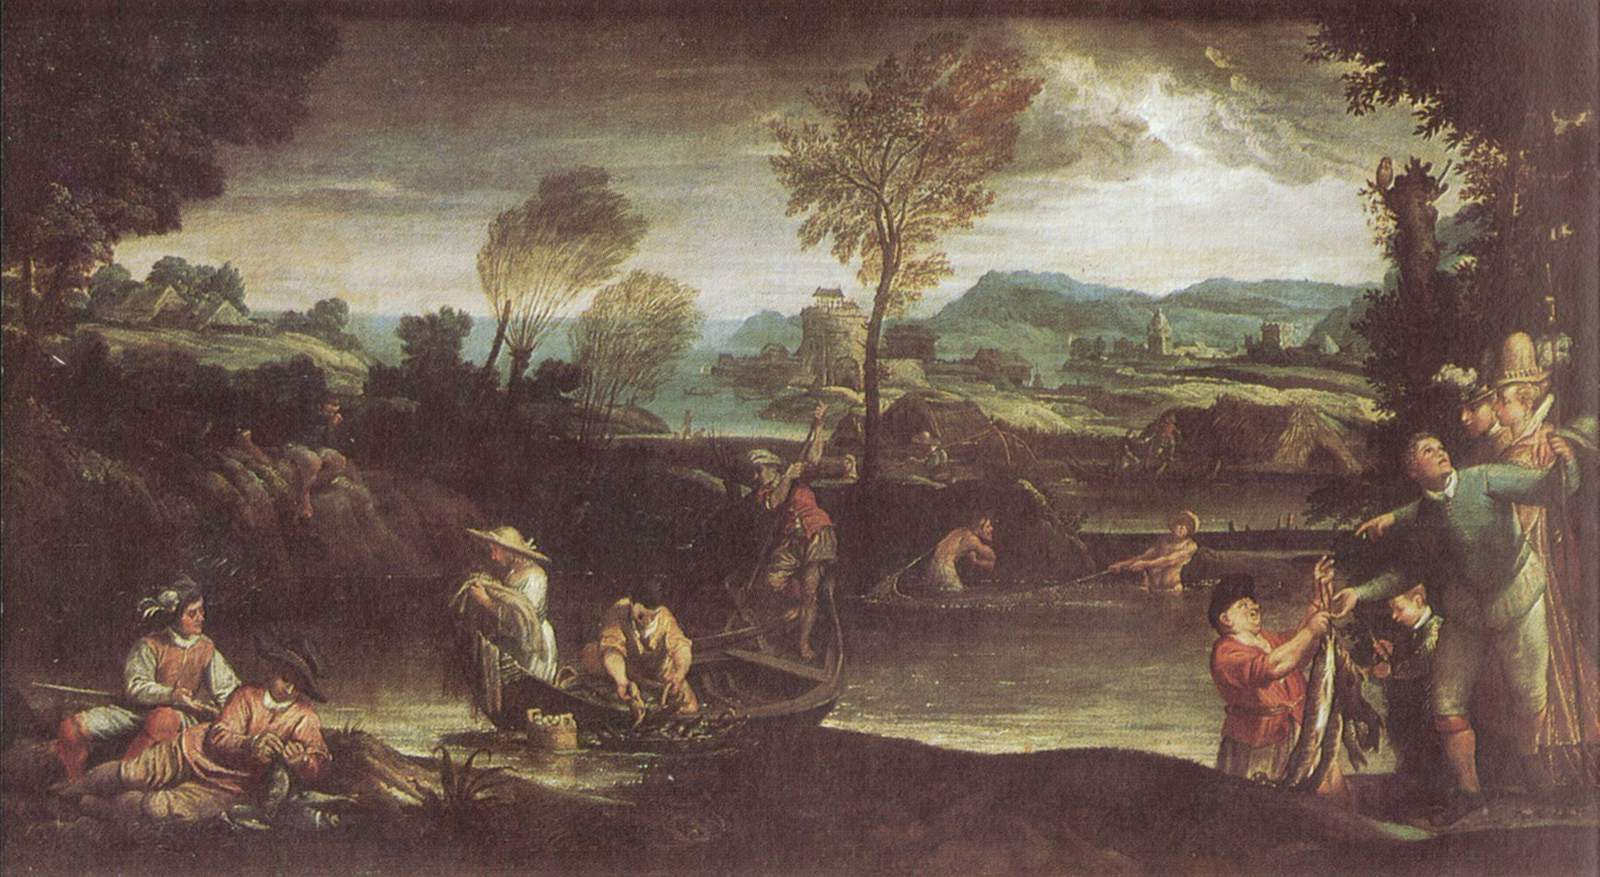 Landschaftsmalerei renaissance  Landschaftsmalerei – Wikipedia